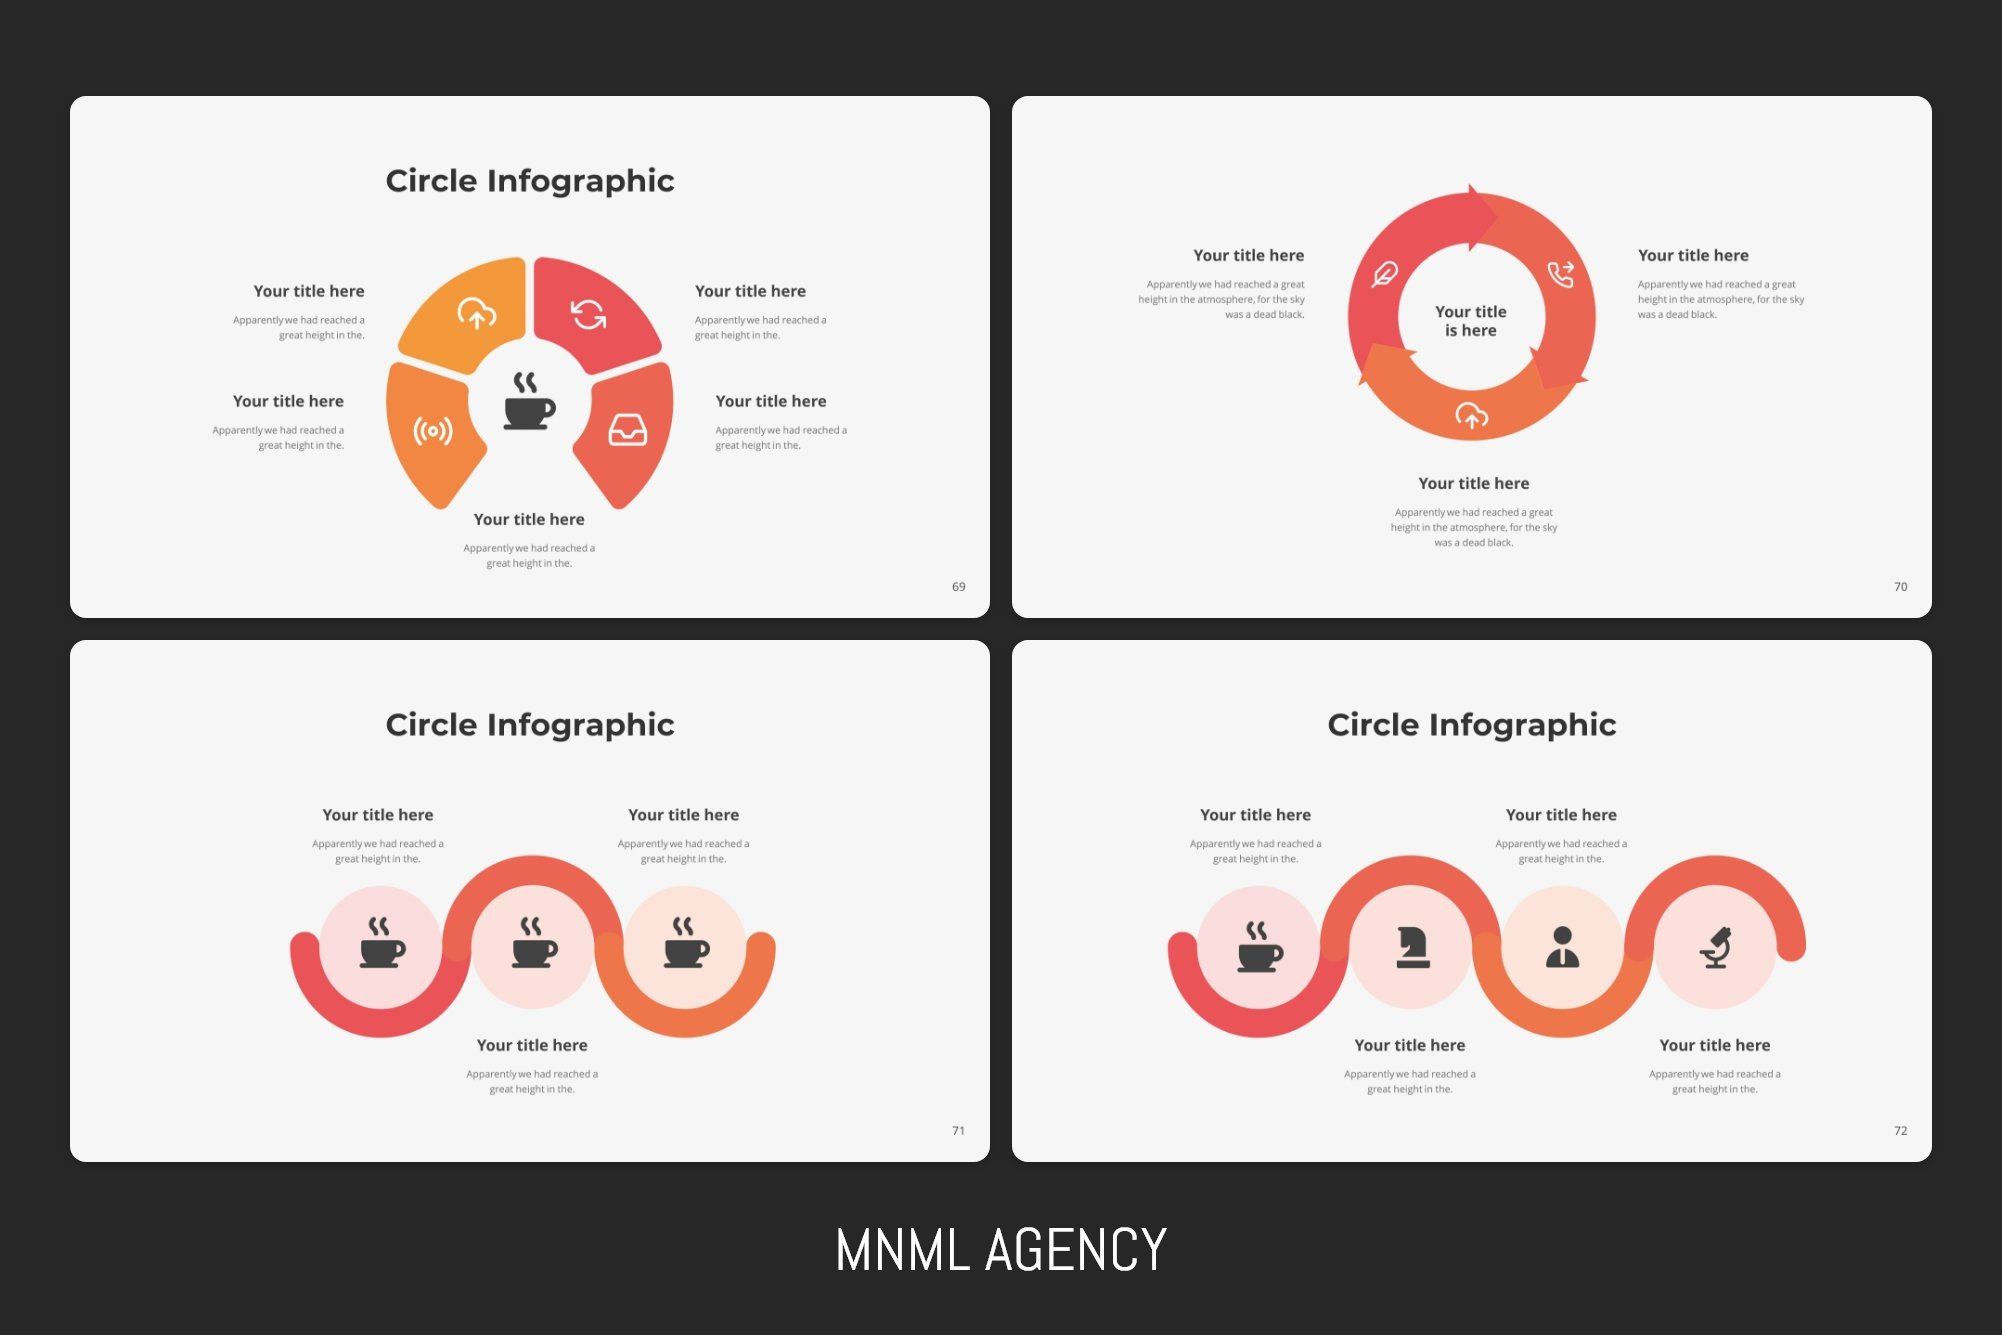 Circle infographic.